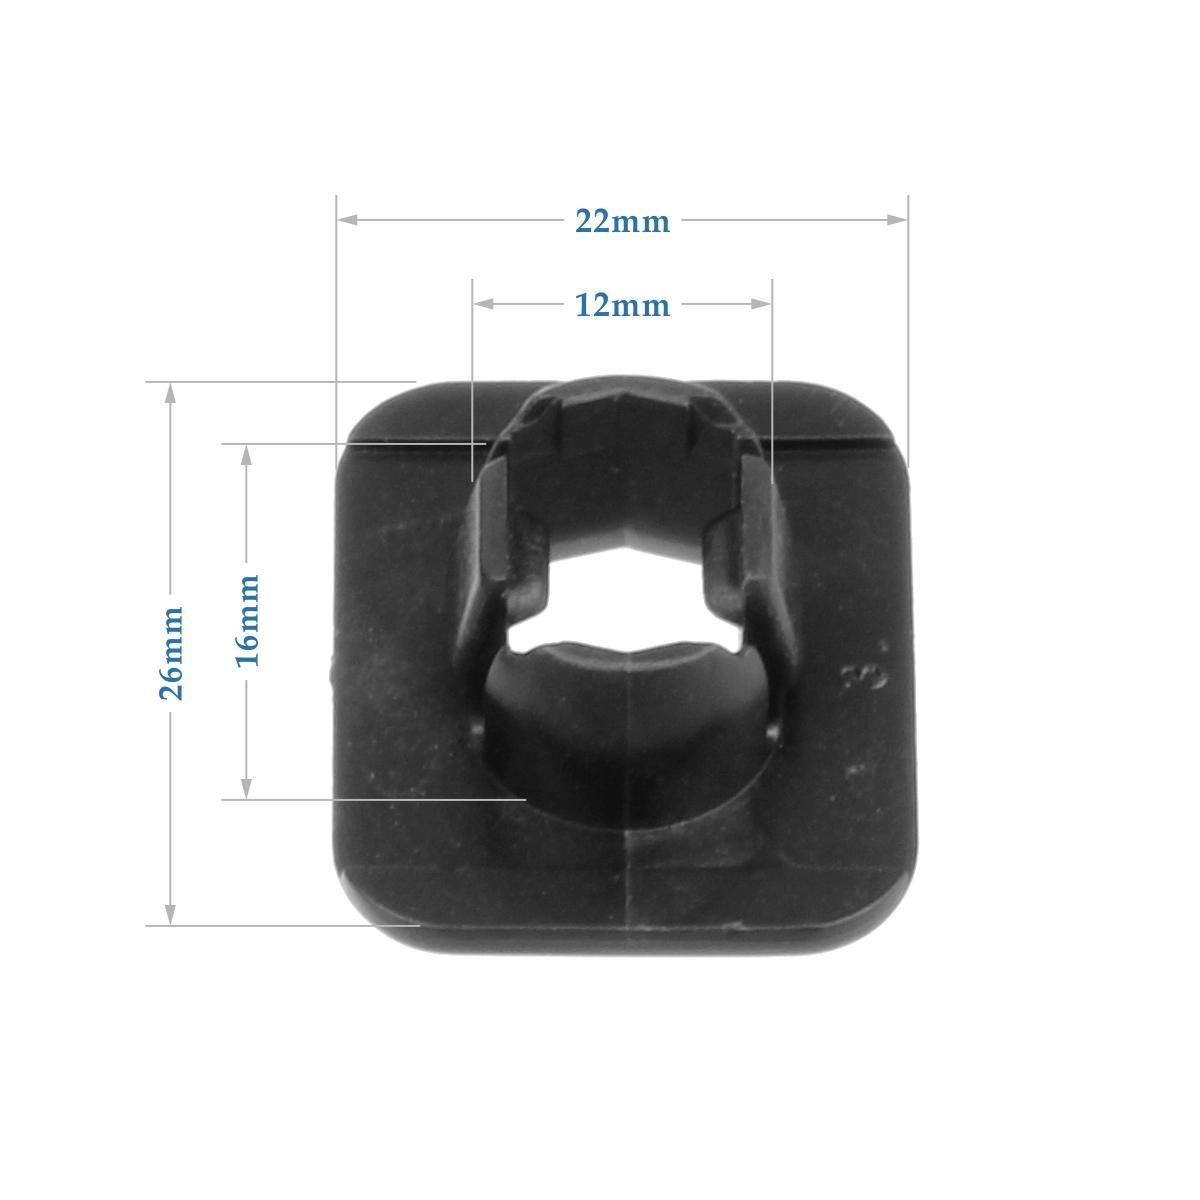 30x Nylon Grille Insulator Backing Plate Clips Rivet Retainer for Nissan Sentra